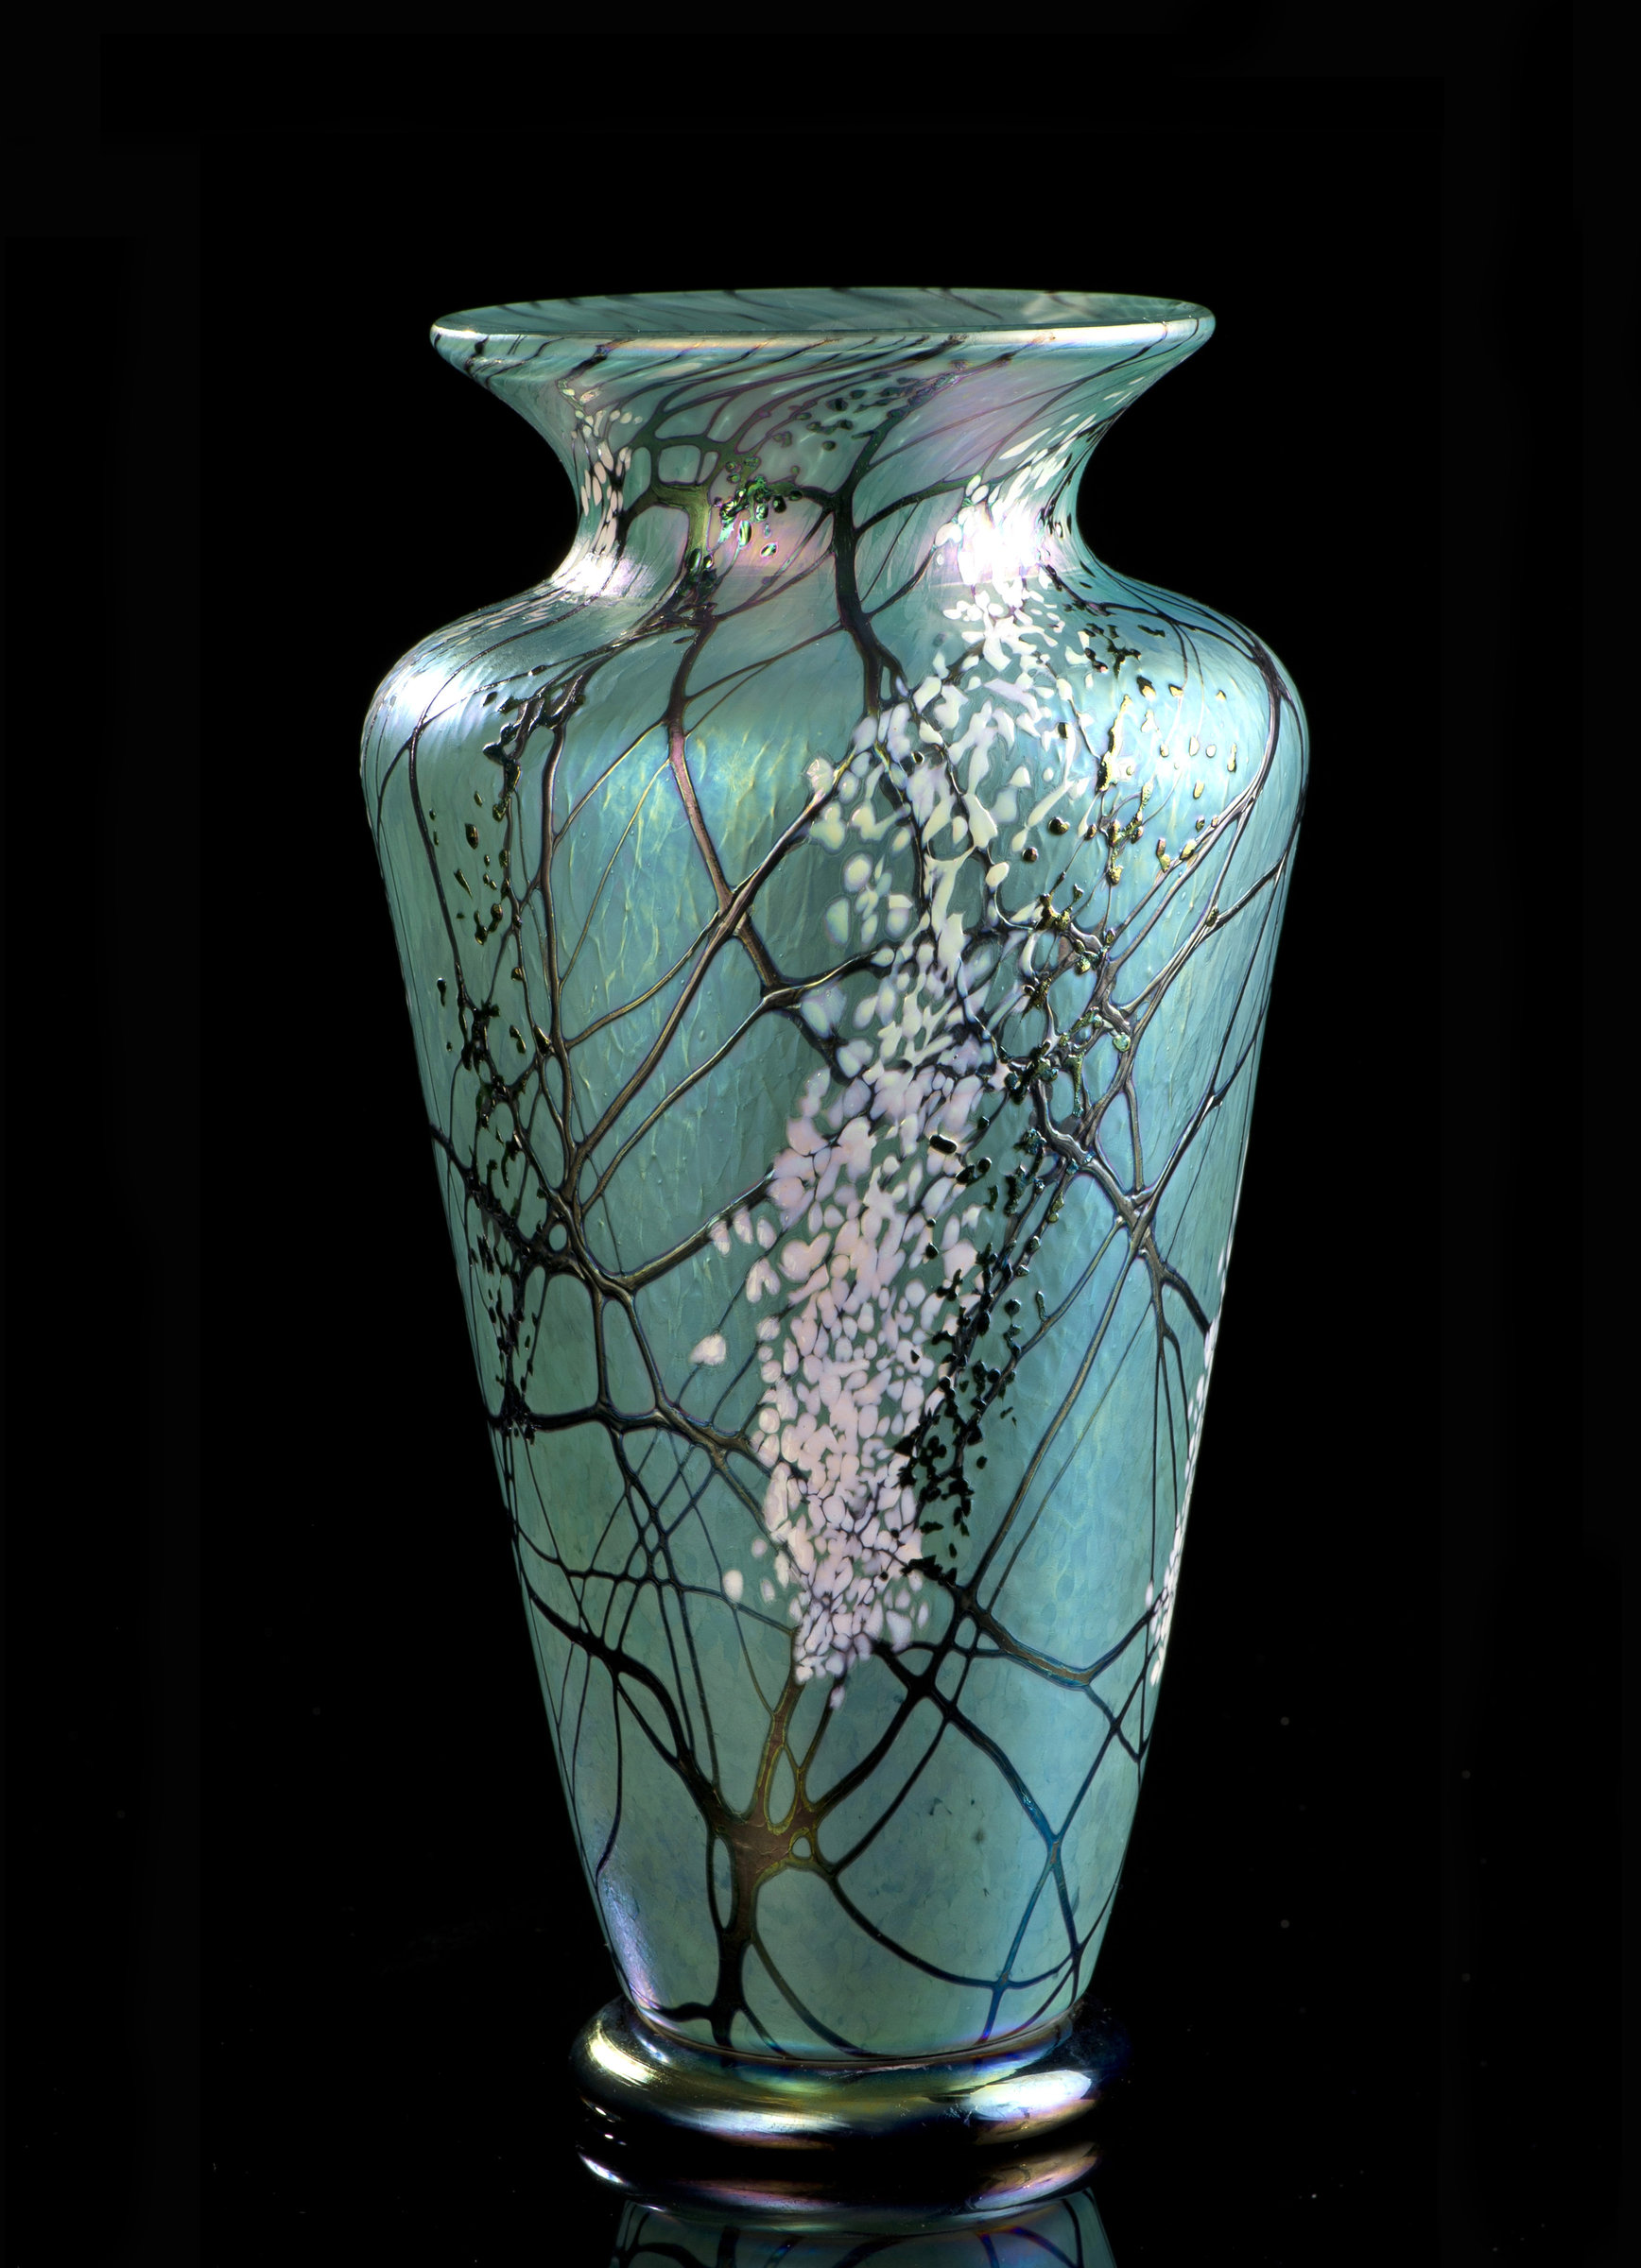 Amazon Traditional Vase By Bryce Dimitruk Art Glass Vase